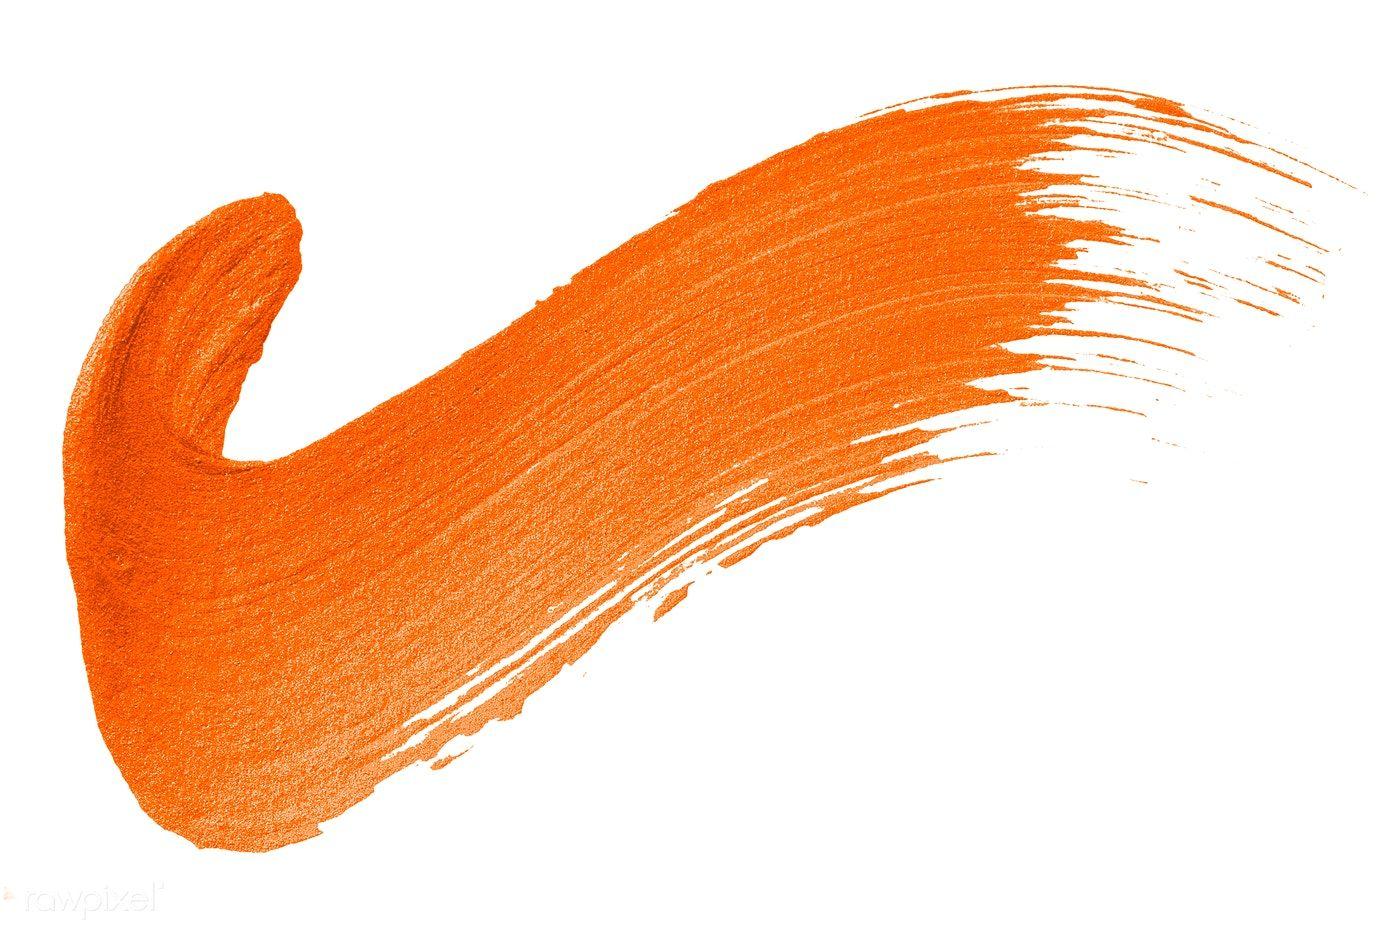 Tick mark shimmery orange brush stroke free image by